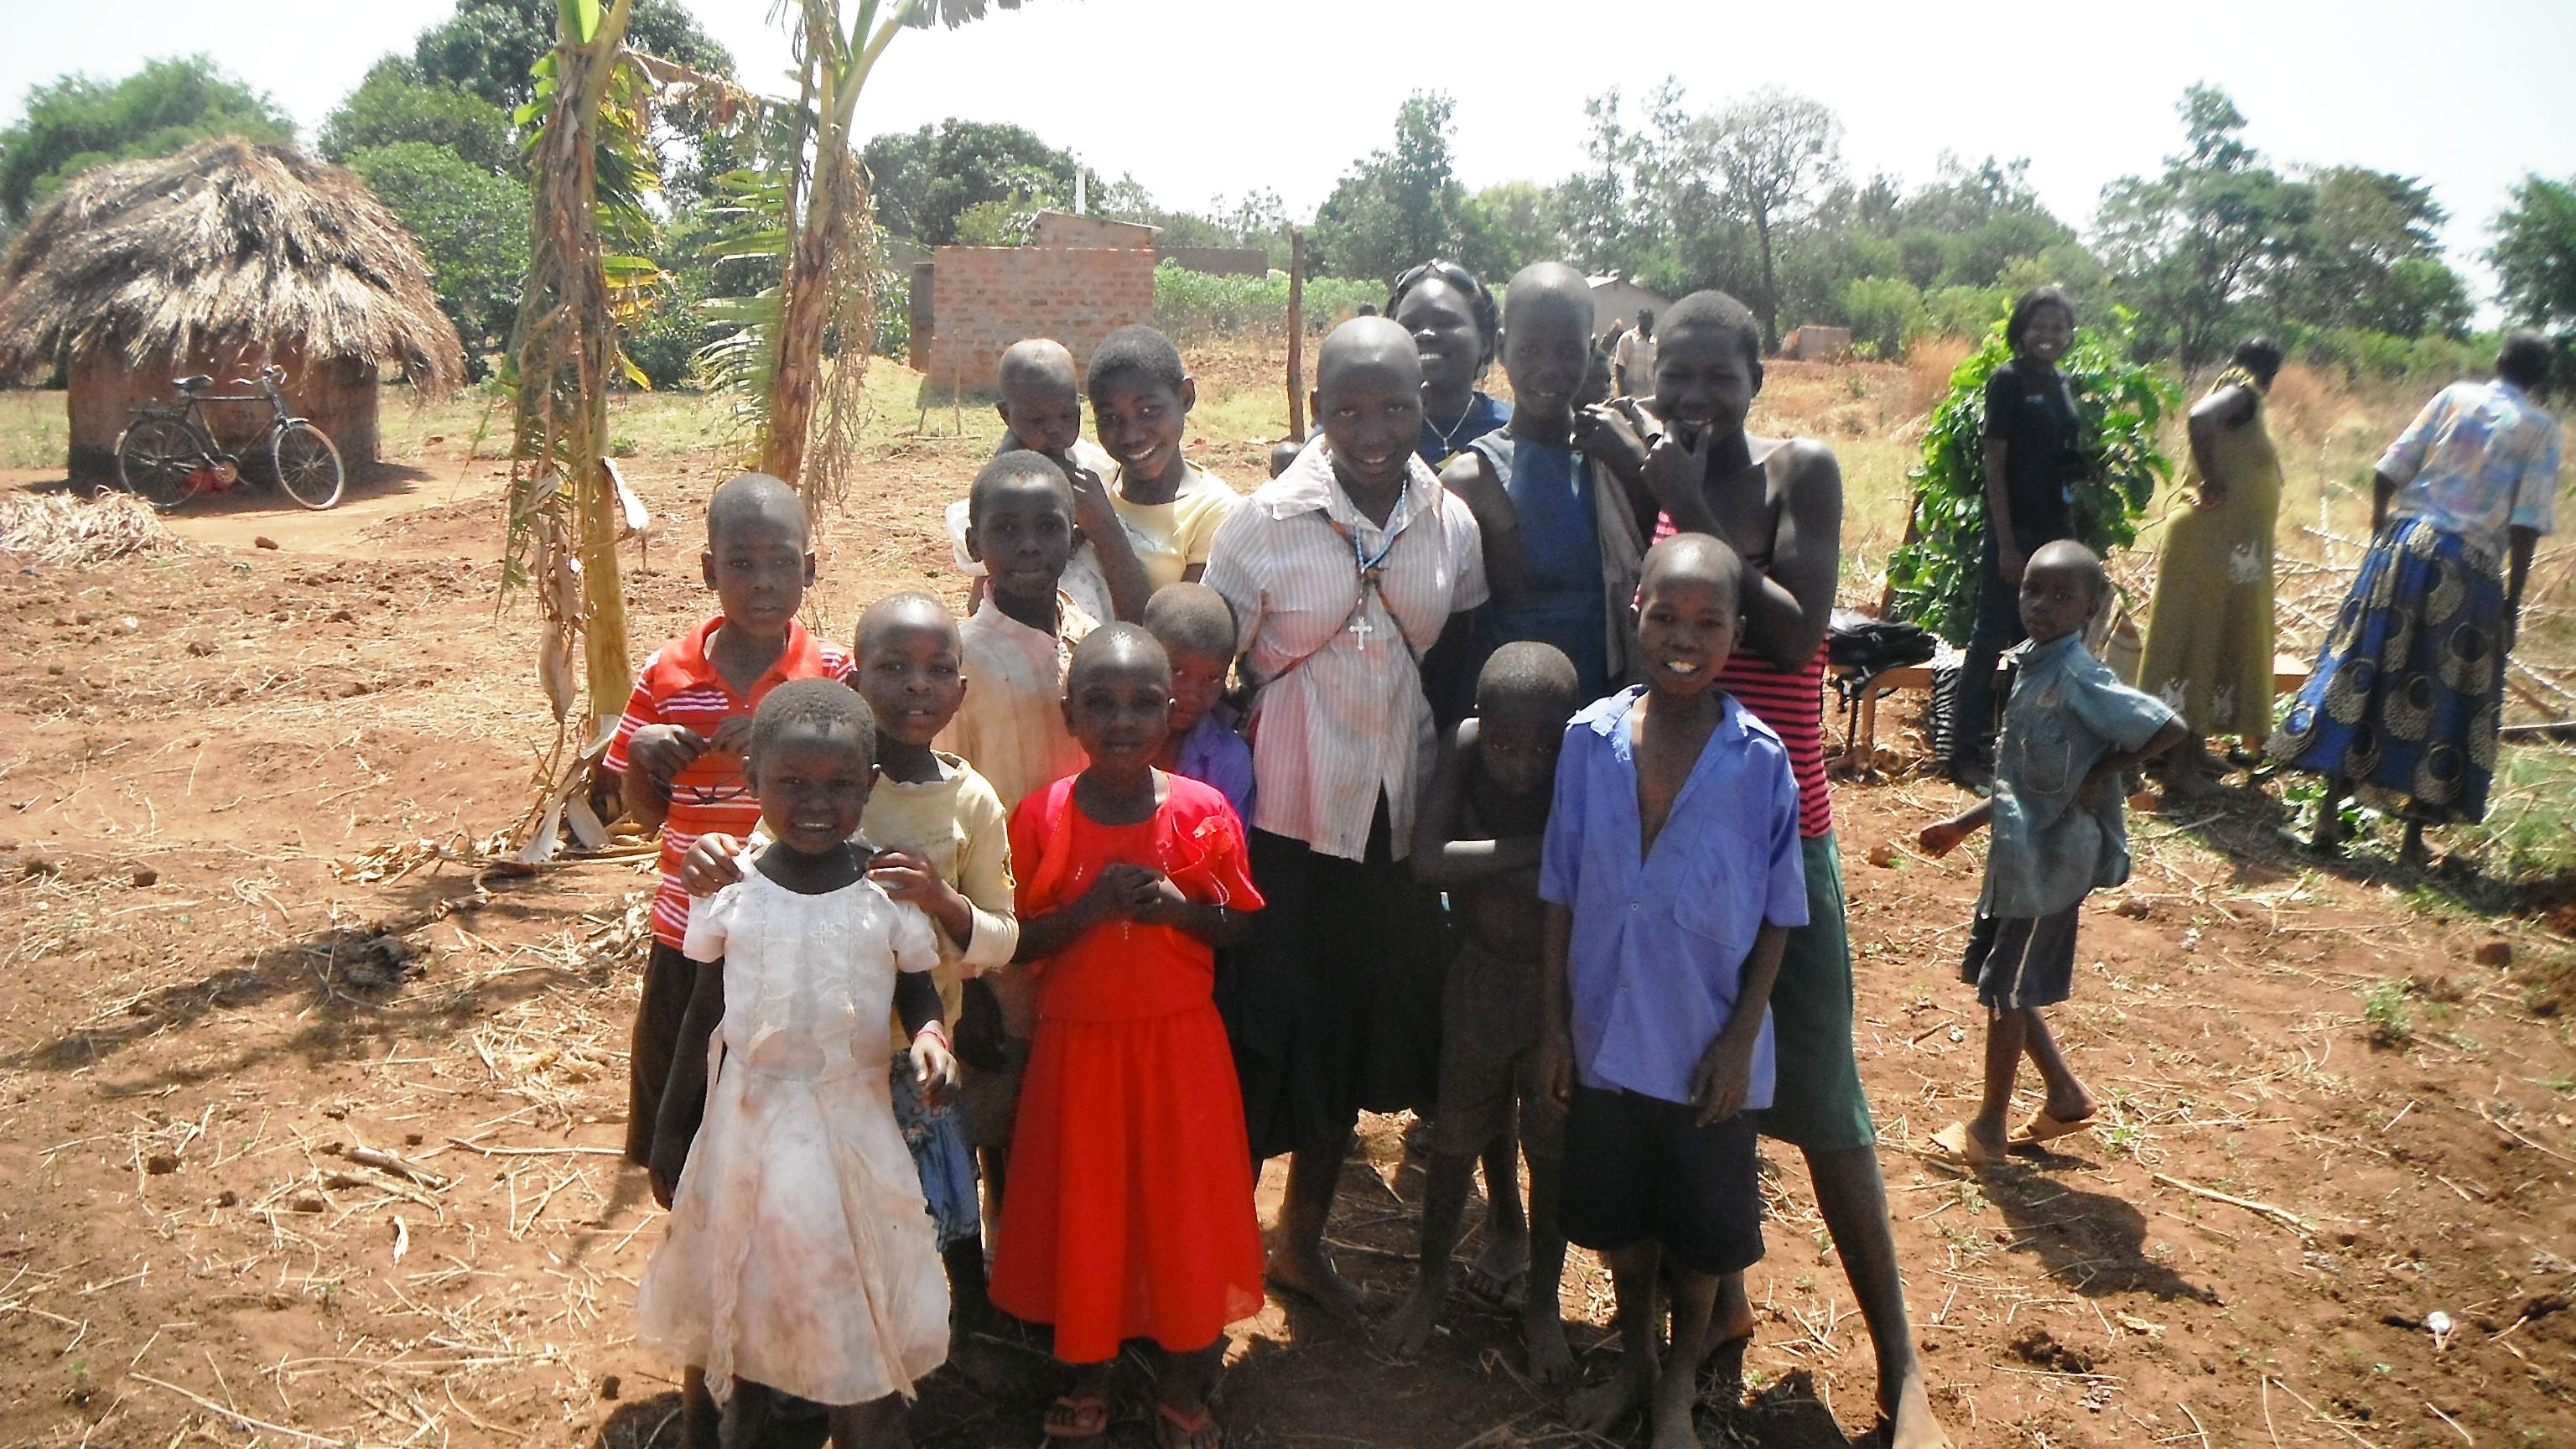 Children at CAPAIDS-Uganda Home of Hope